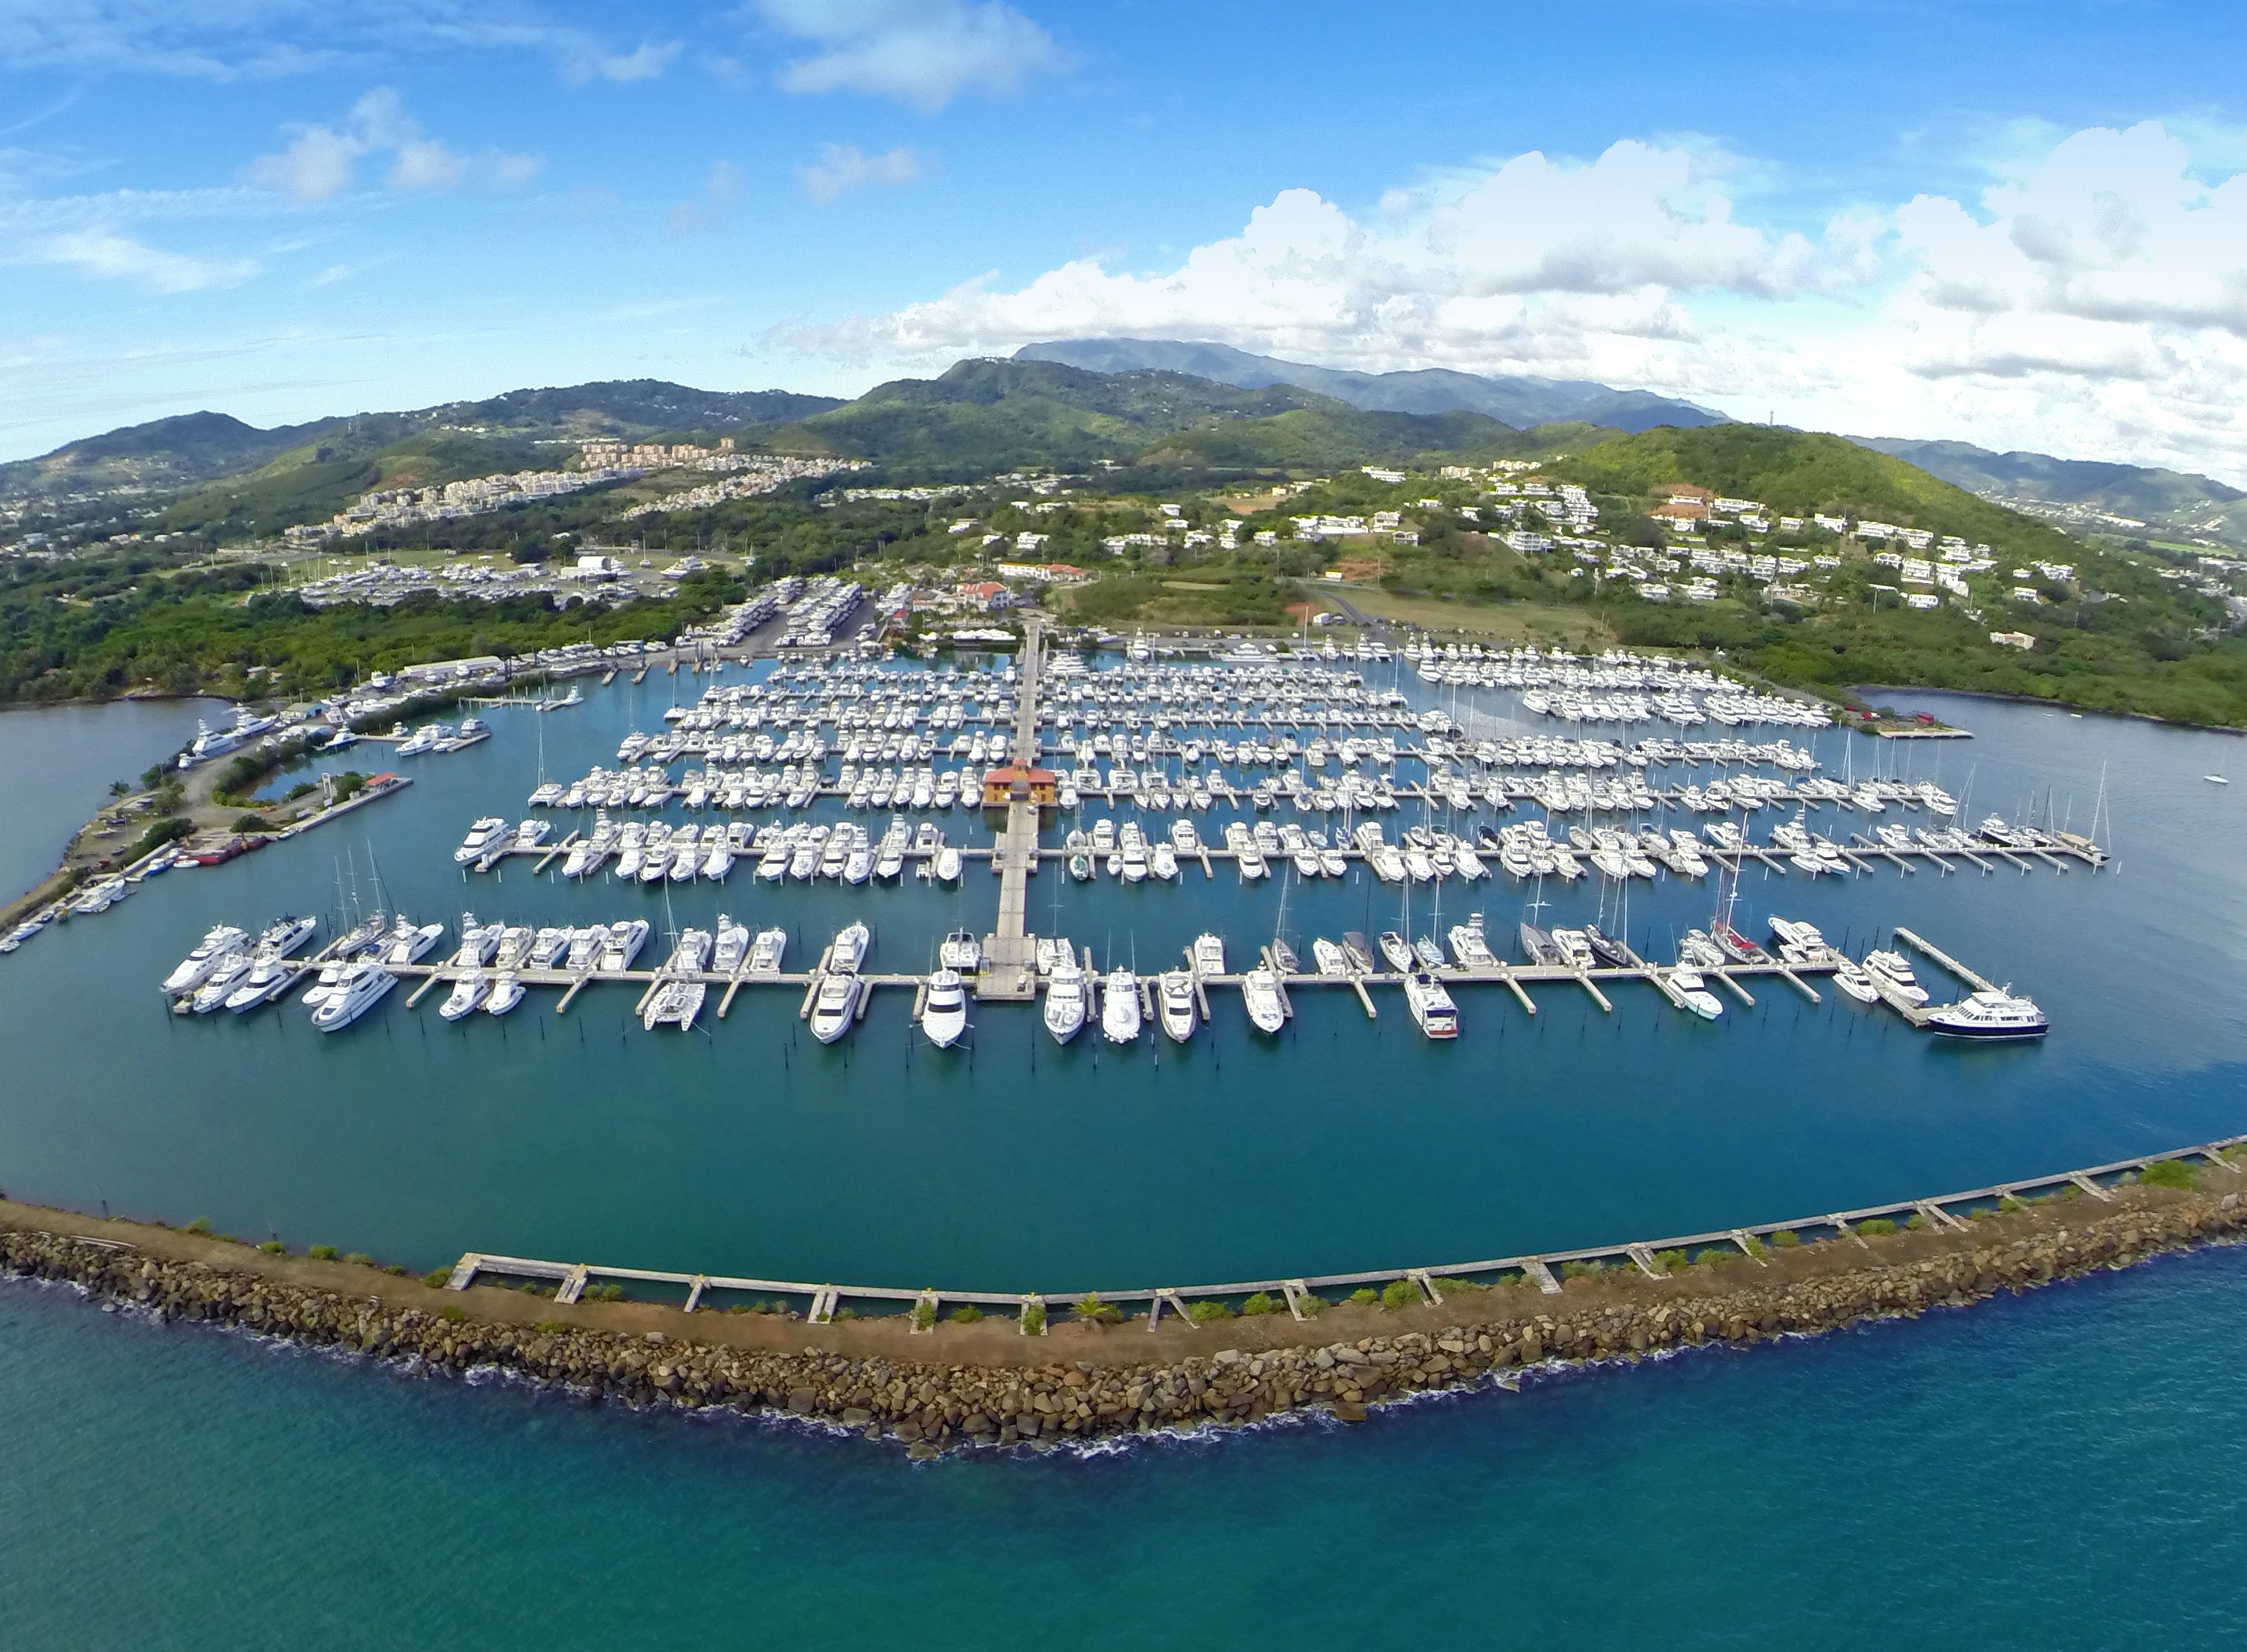 Puerto del Rey Marina in Fajardo, PR, United States - Marina Reviews